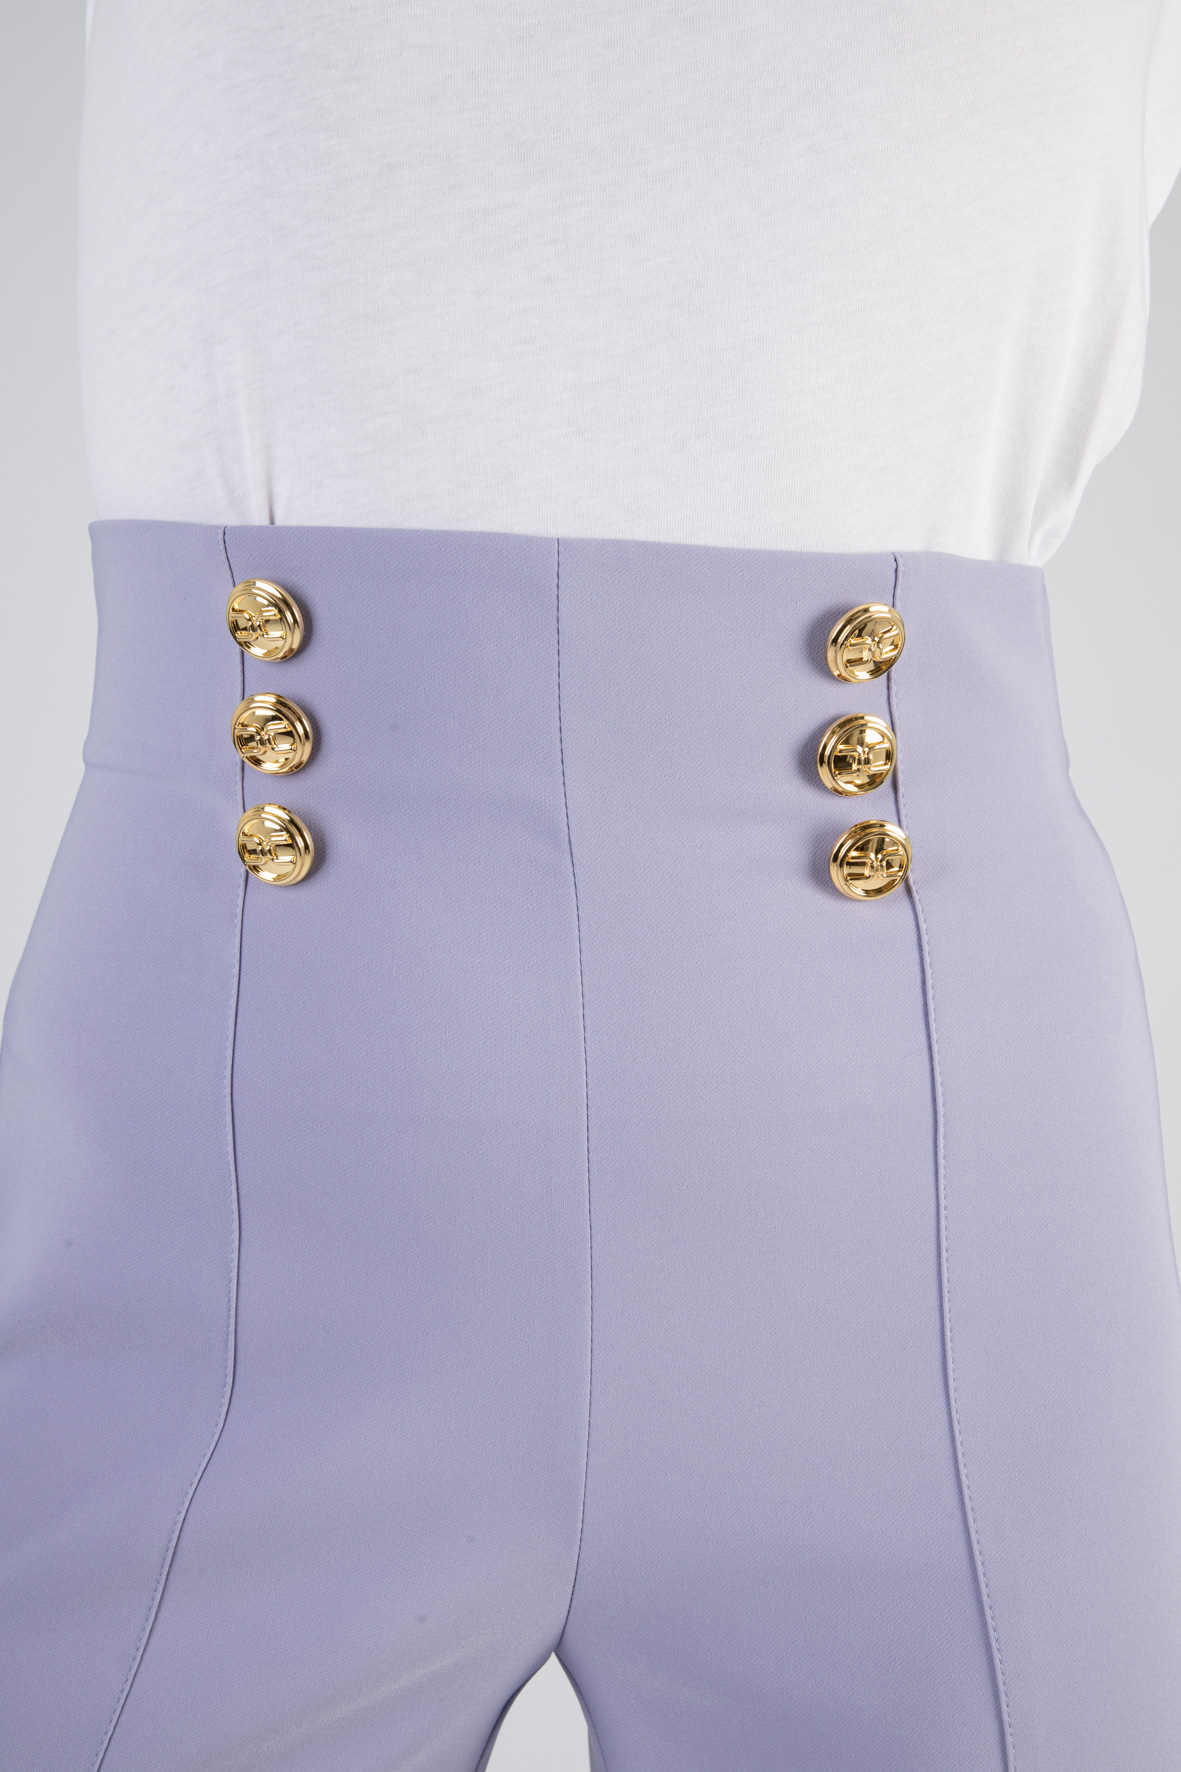 Pantalone a palazzo con bottoni logati oro ELISABETTA FRANCHI | Pantaloni | PA38311E2Q38